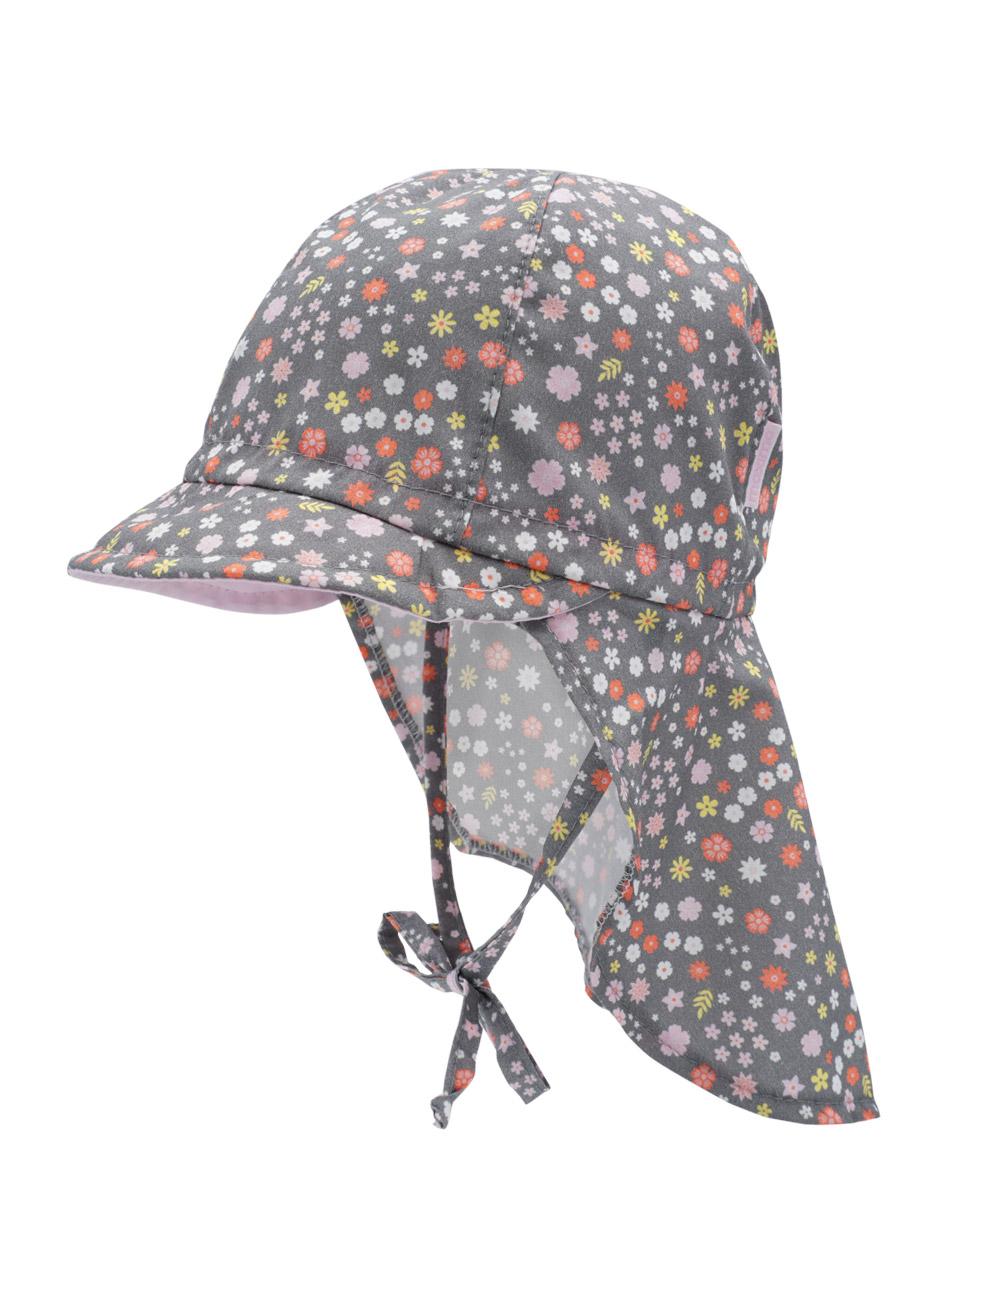 GIRL-Schildmütze 49 Maximo. Farbe: holzkohle-rosa-blümchen, Größe: 49